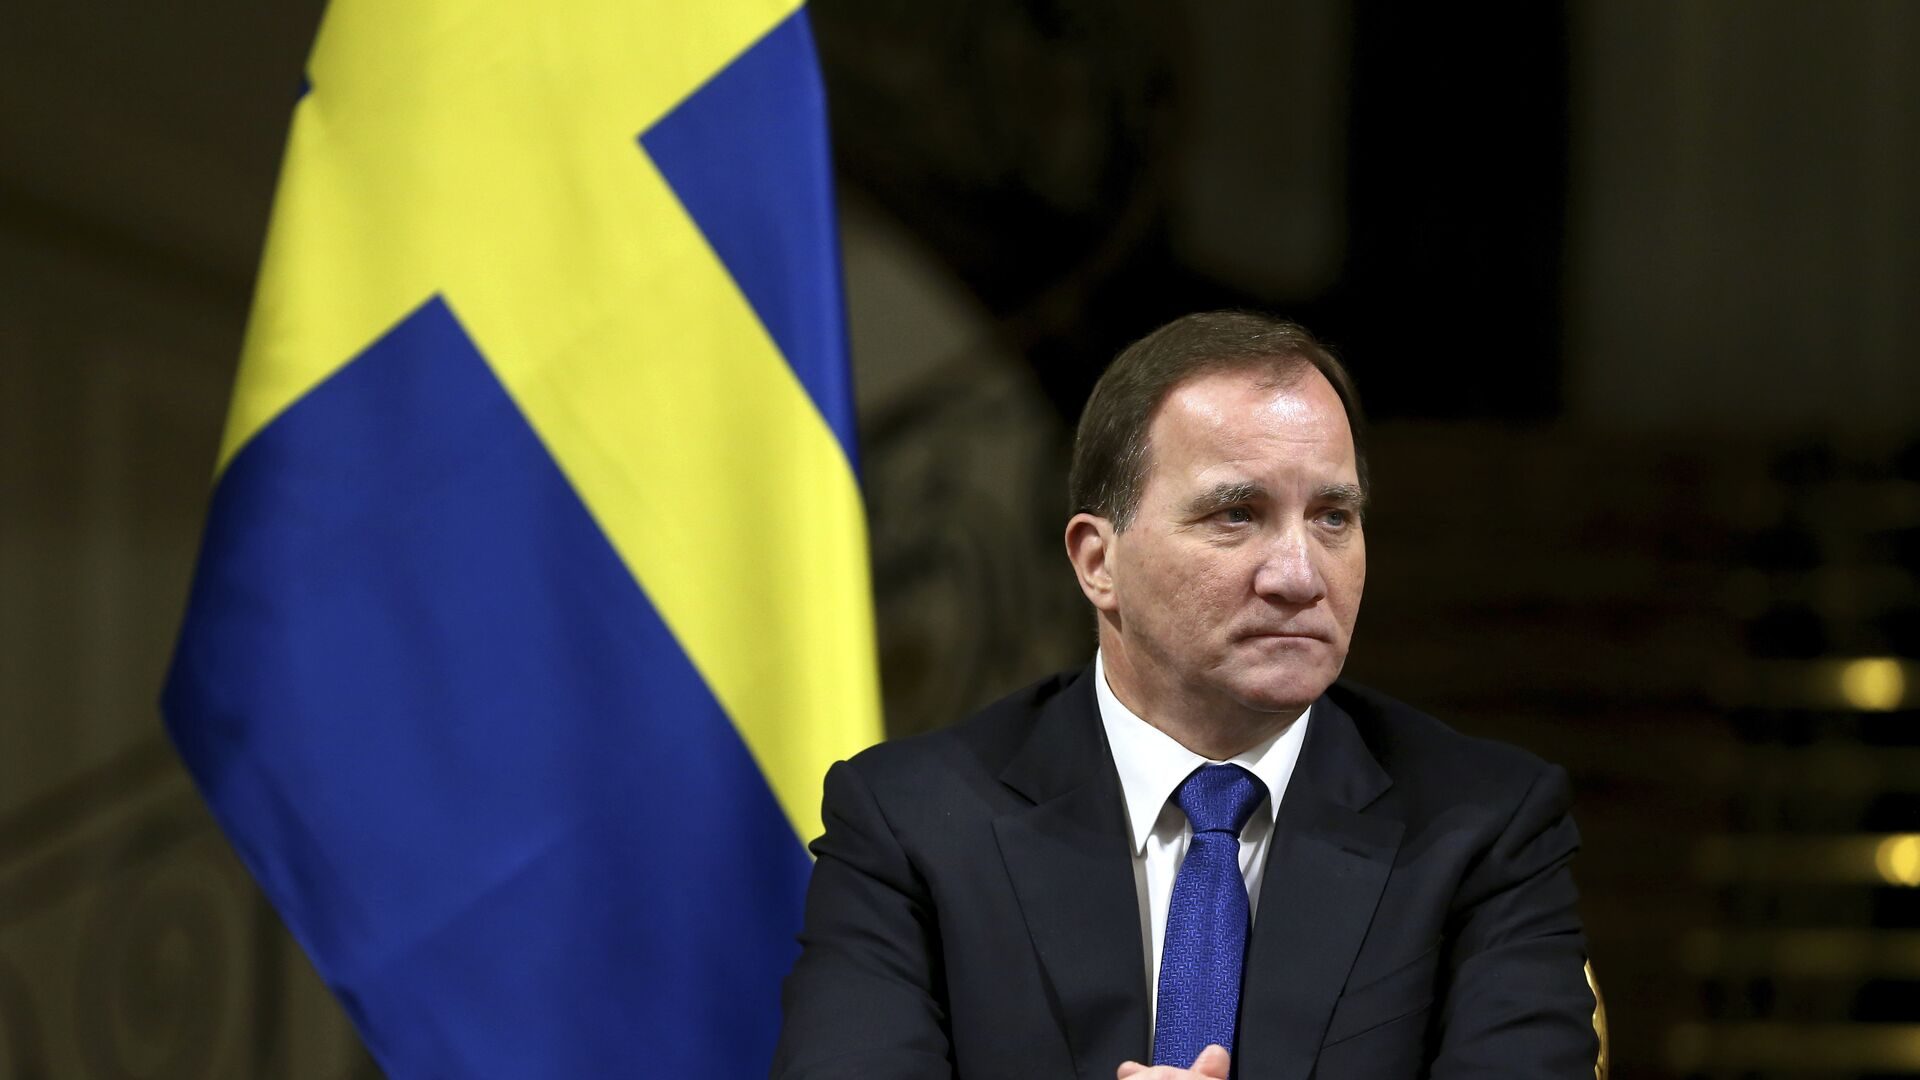 Primo ministro svedese Stefan Lofven  - Sputnik Italia, 1920, 28.06.2021